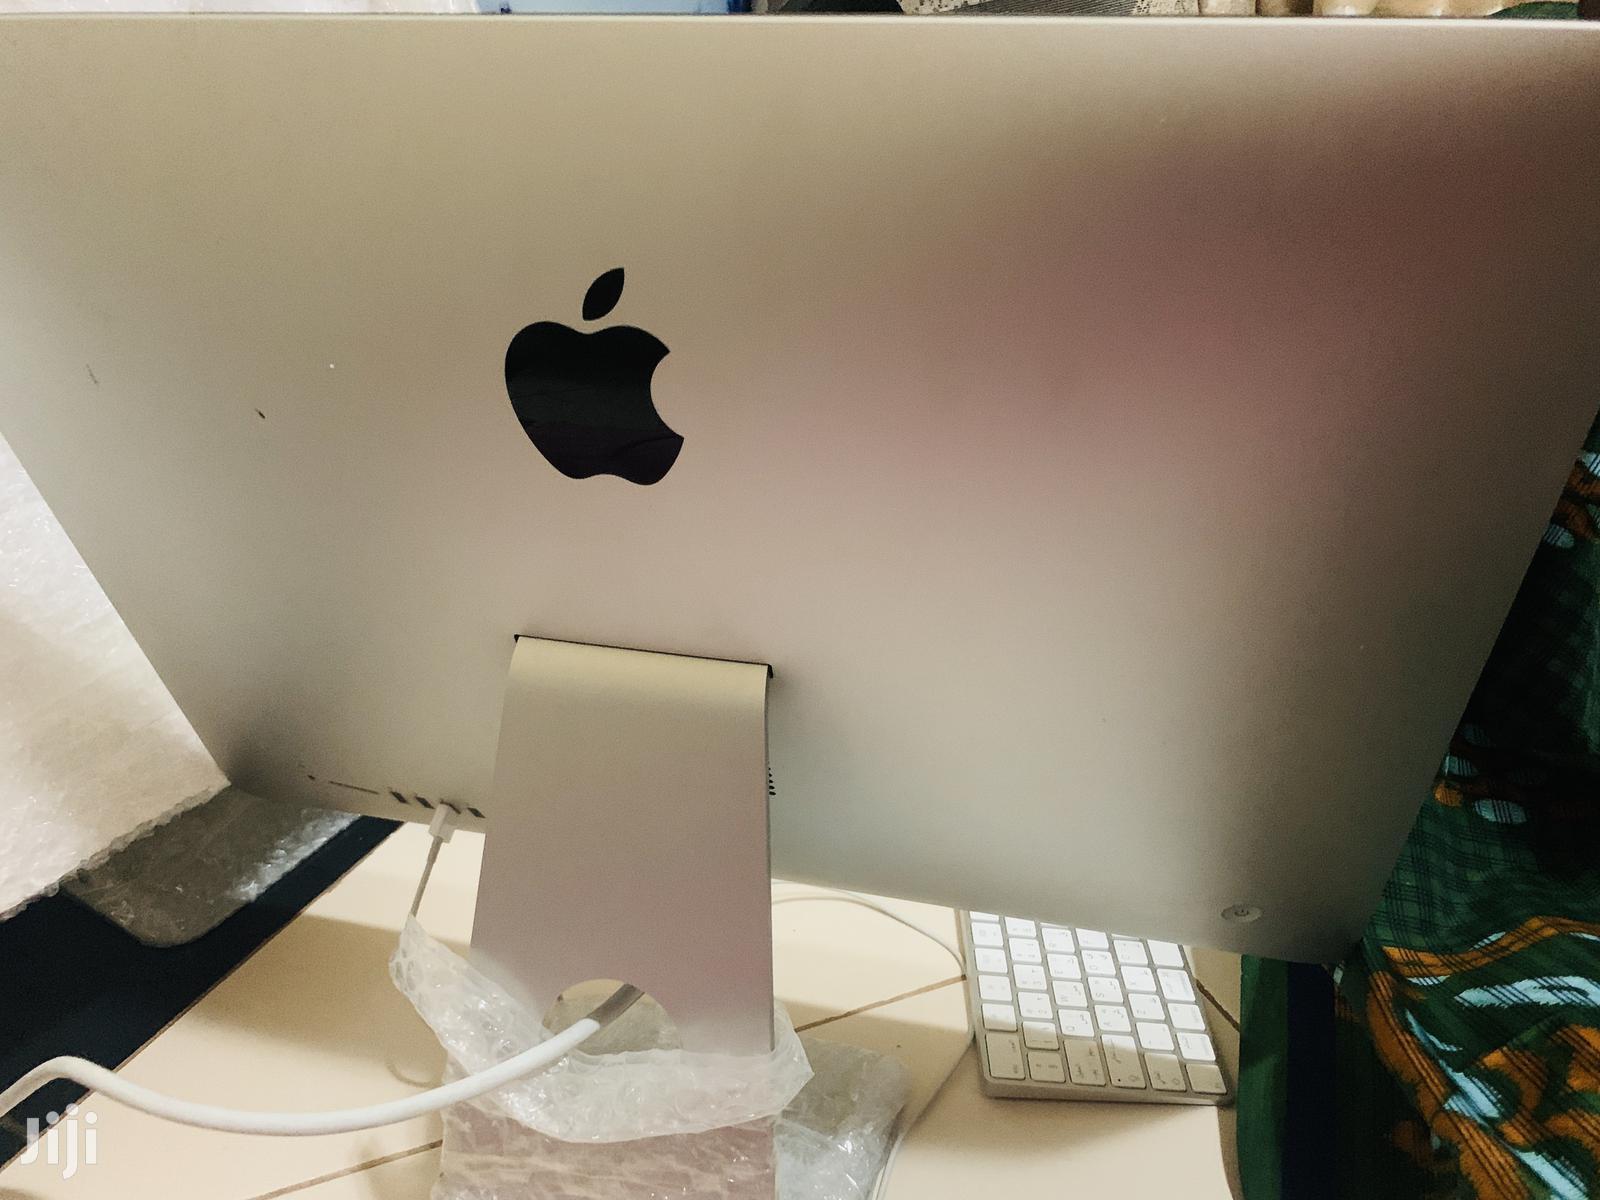 New Desktop Computer Apple iMac 8GB Intel Core I5 HDD 1T | Laptops & Computers for sale in Kampala, Central Region, Uganda